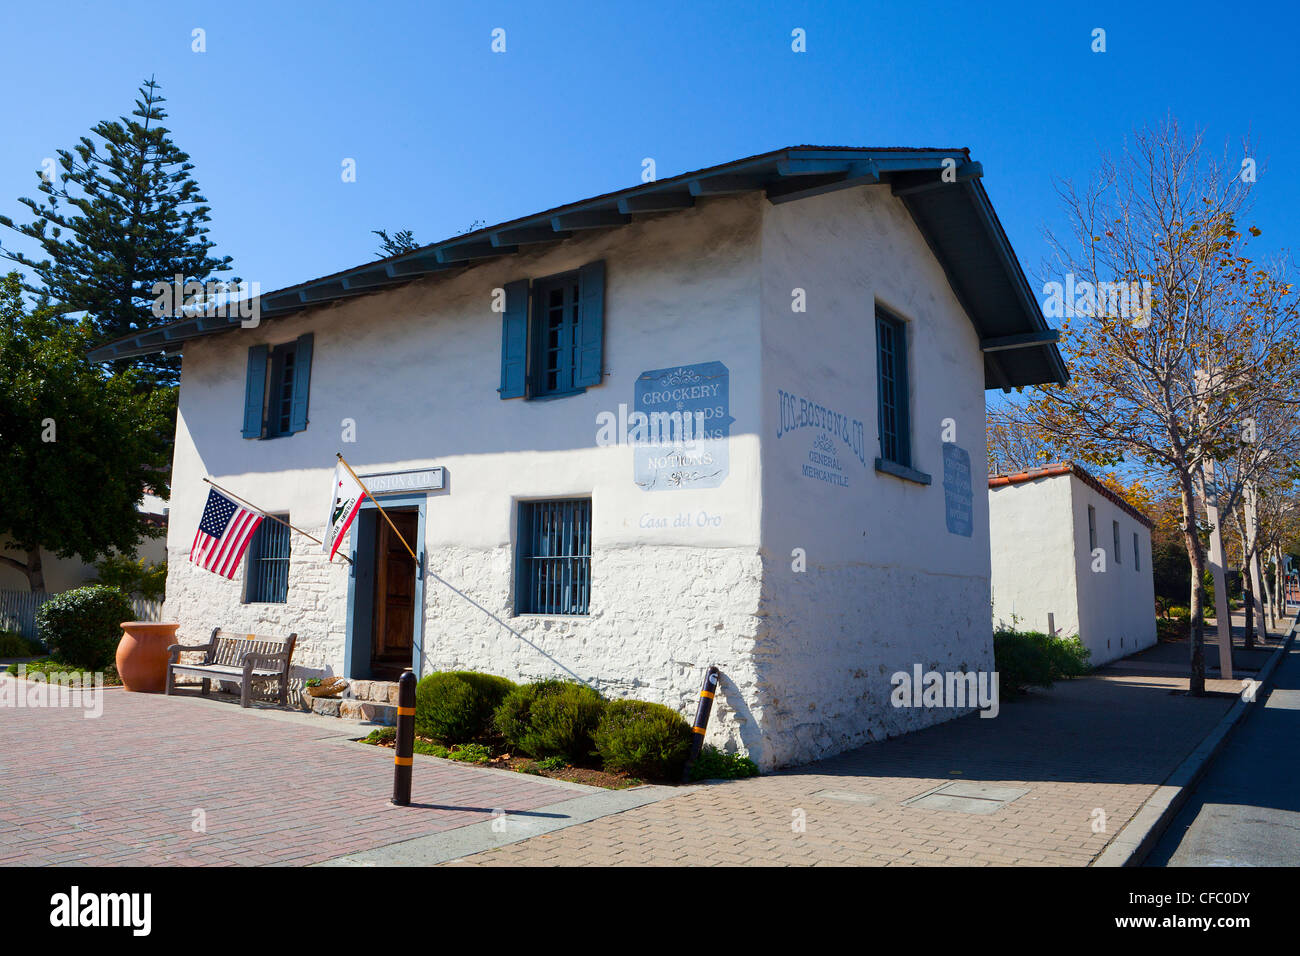 USA, United States, America, California, Monterey, City, Historical, Casa del Oro, Gold House, administration, colonial, - Stock Image